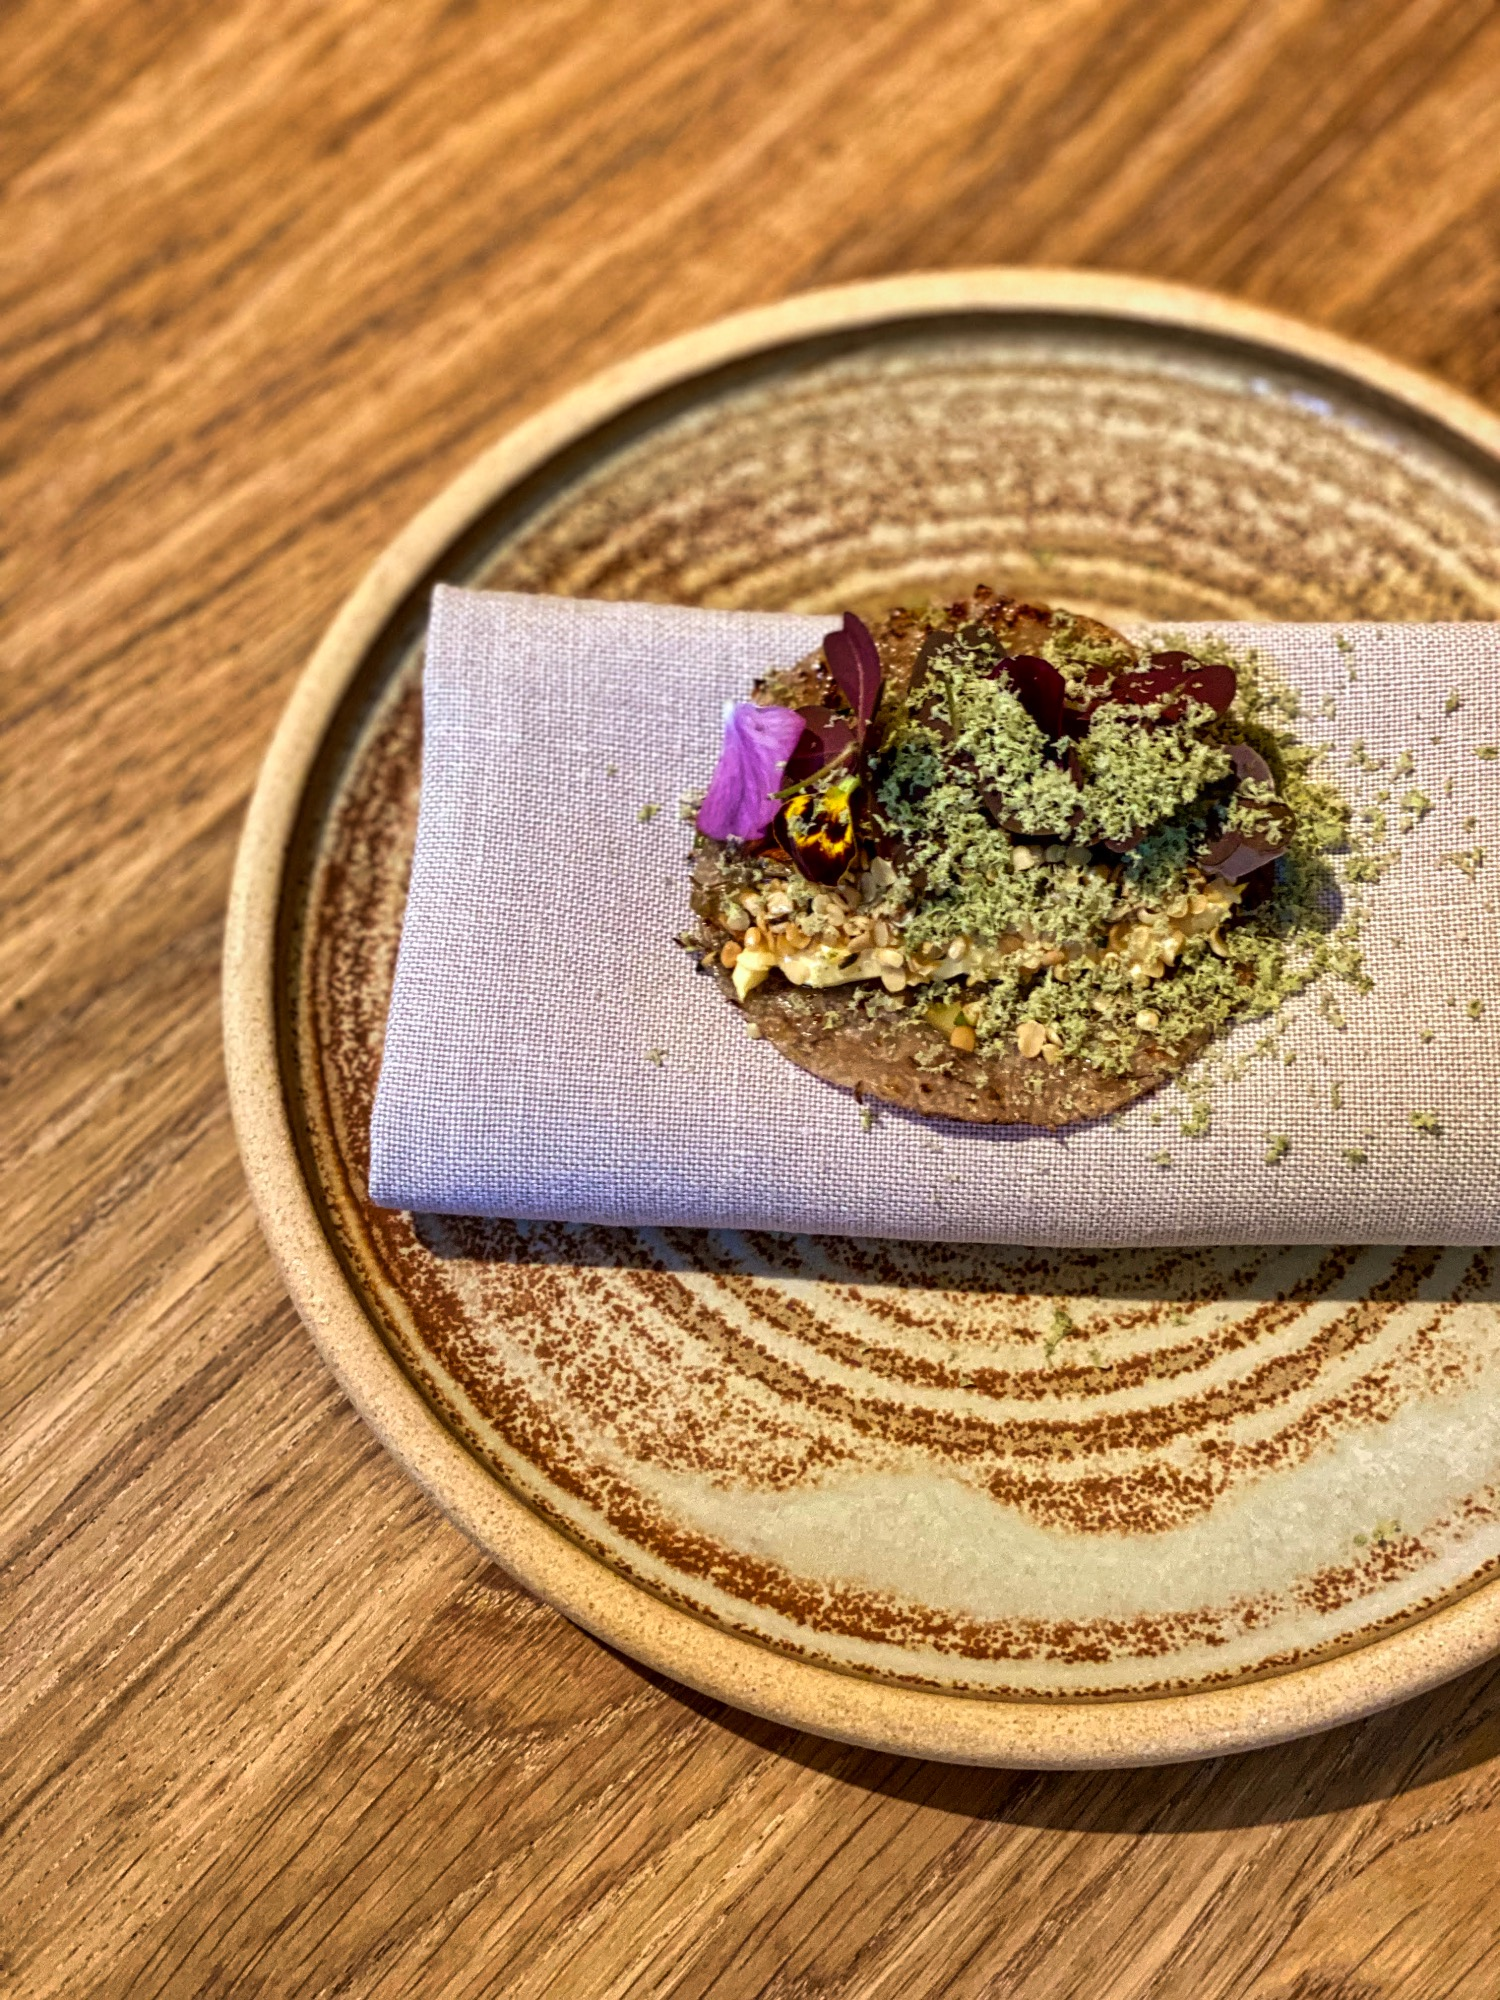 img_5846_salt_budapest_restaurant_jokuti_vilagevo.jpeg